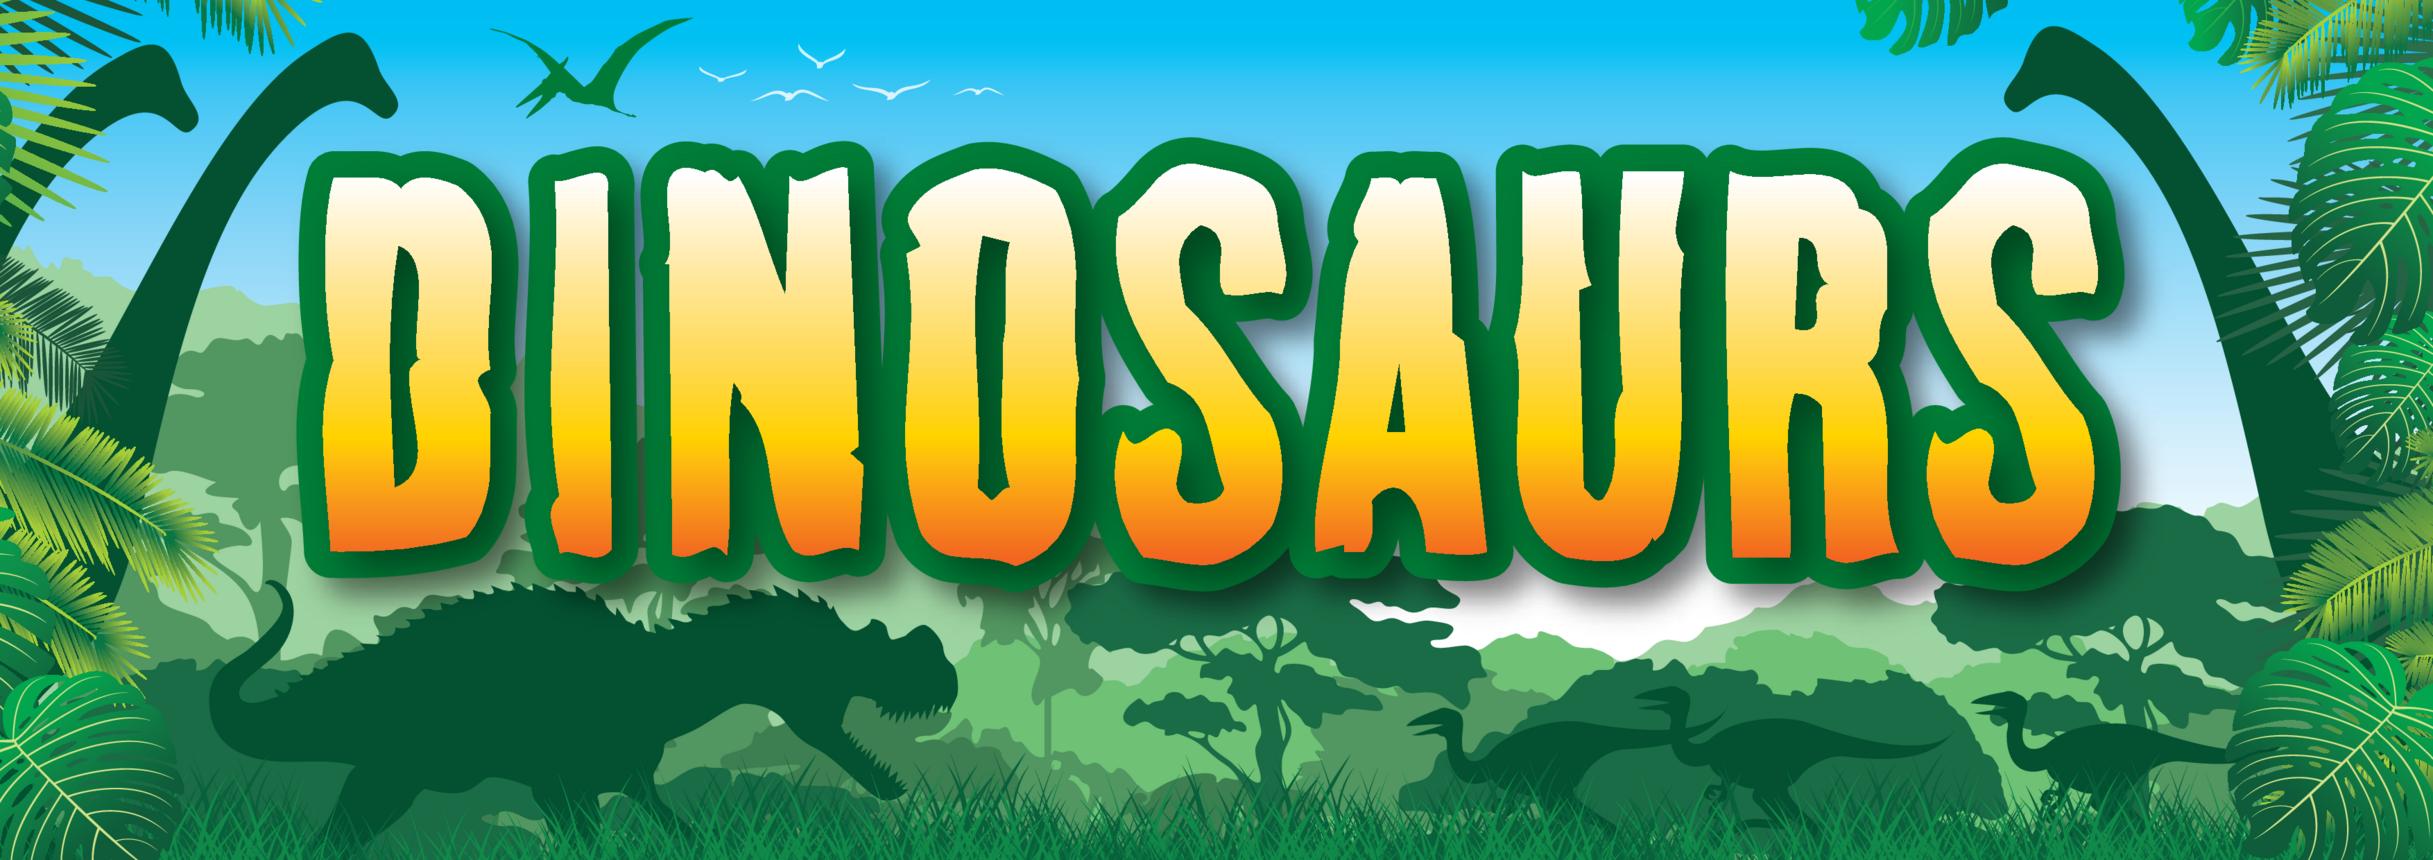 Dinosaurs Wall Display Banner A3